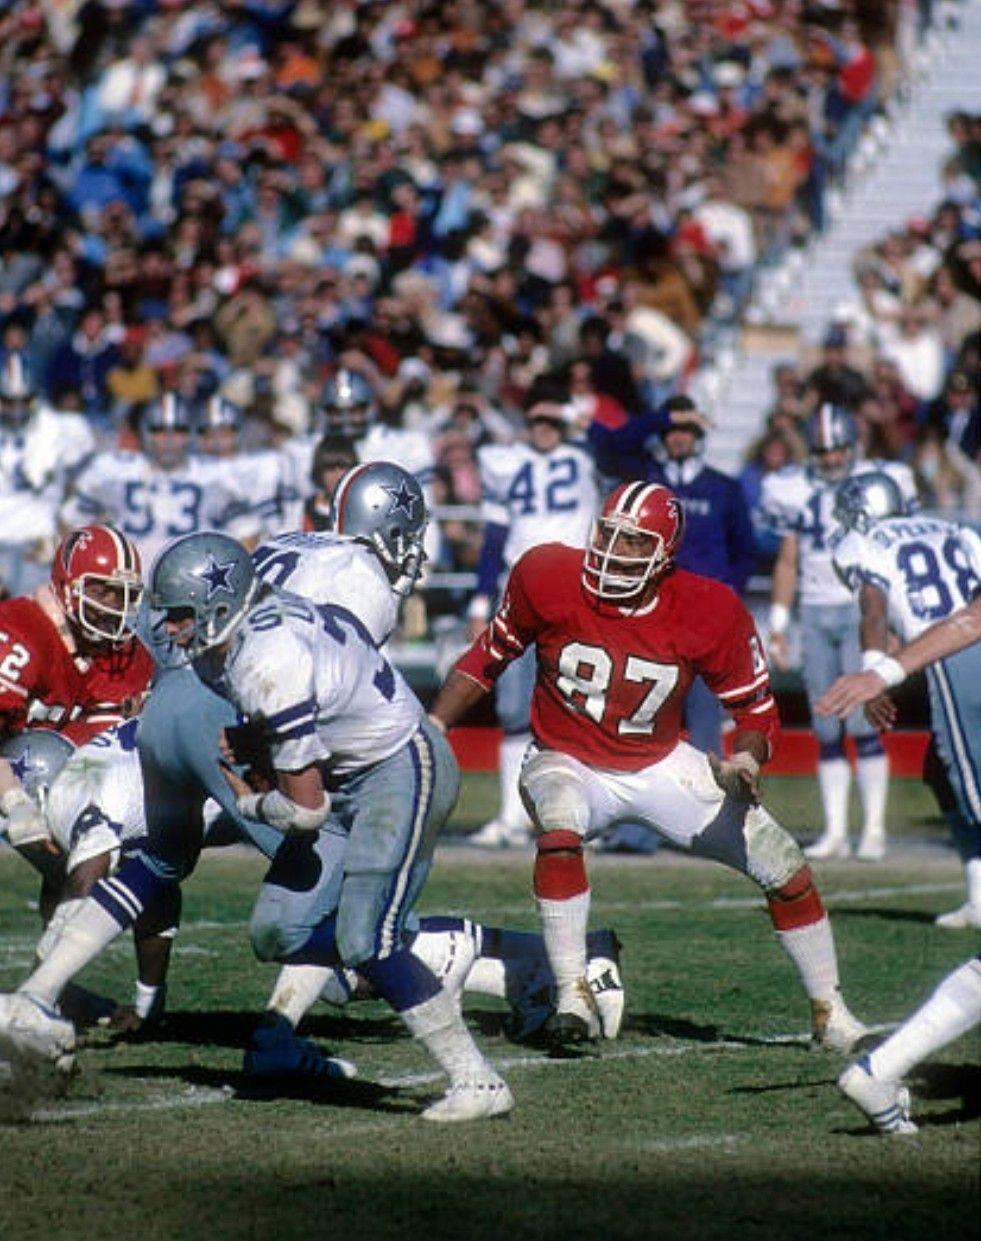 1976 Cowboys At Falcons Nfl Uniforms American Football League Nfl History